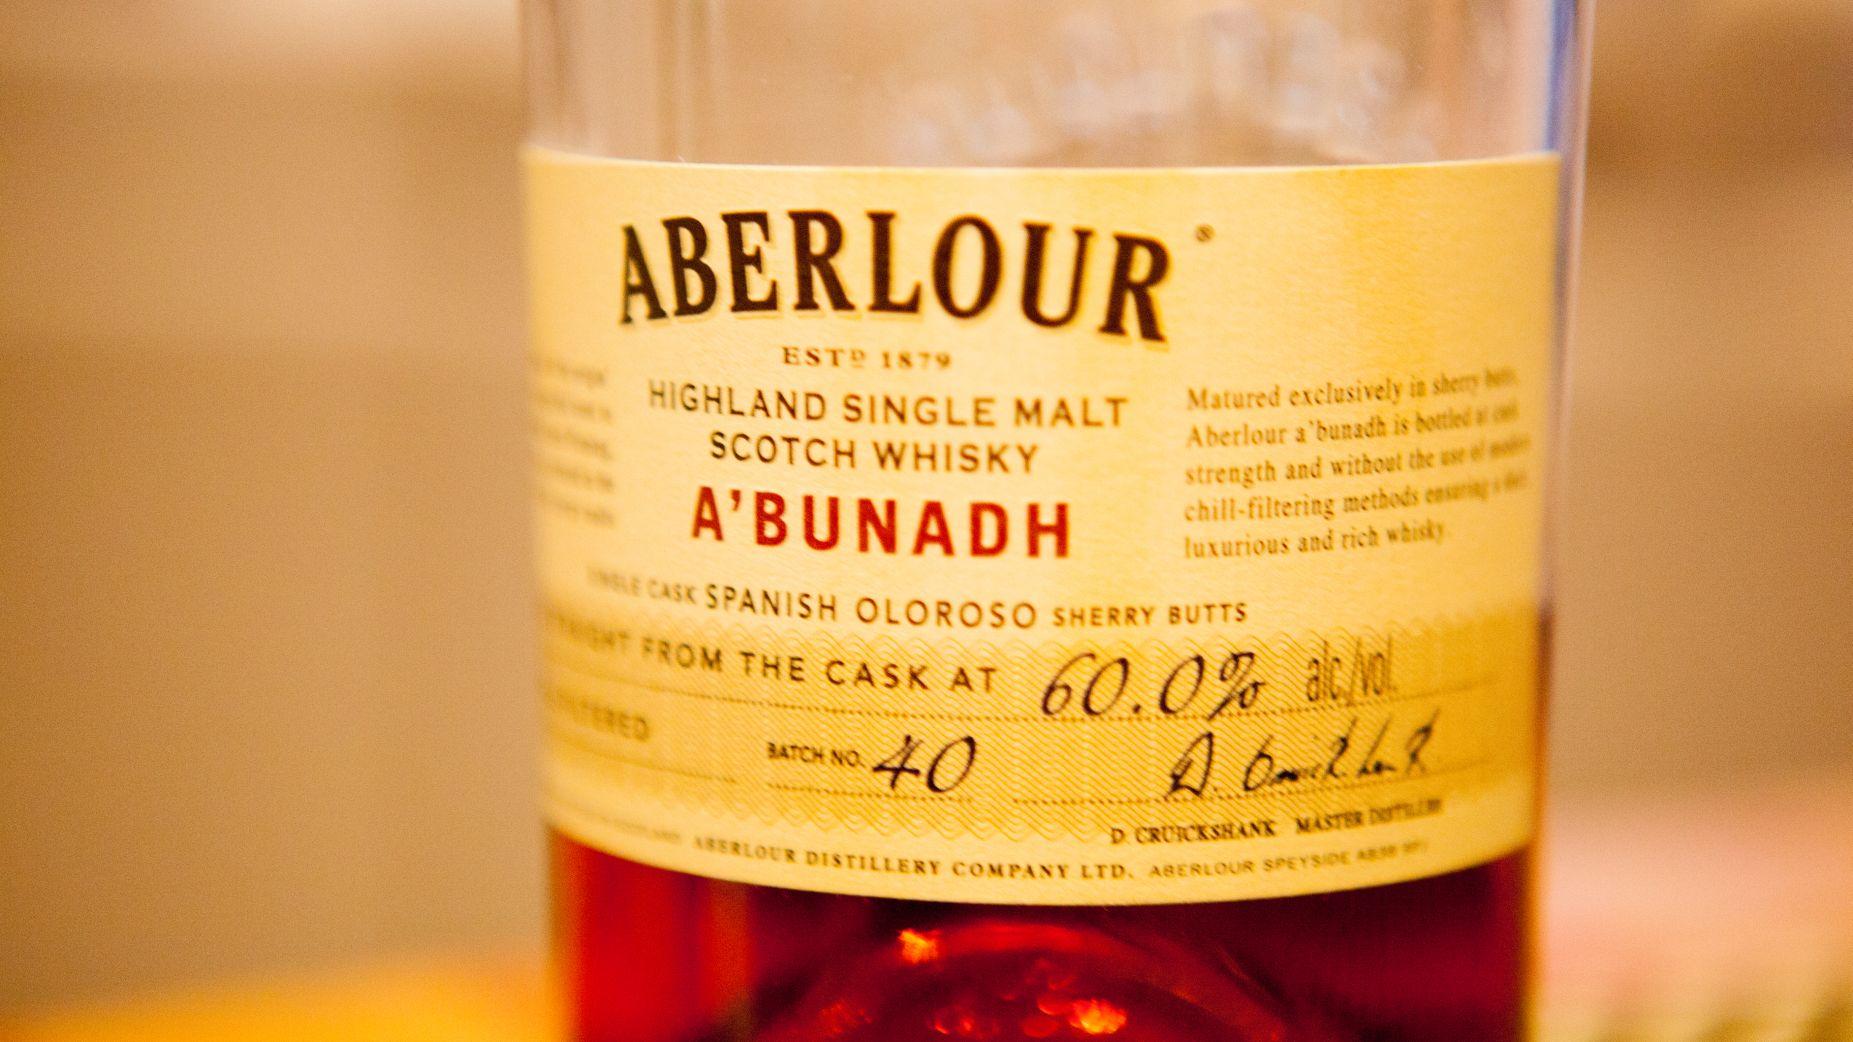 Aberlour A'bunadh Batch 40 Whisky Review